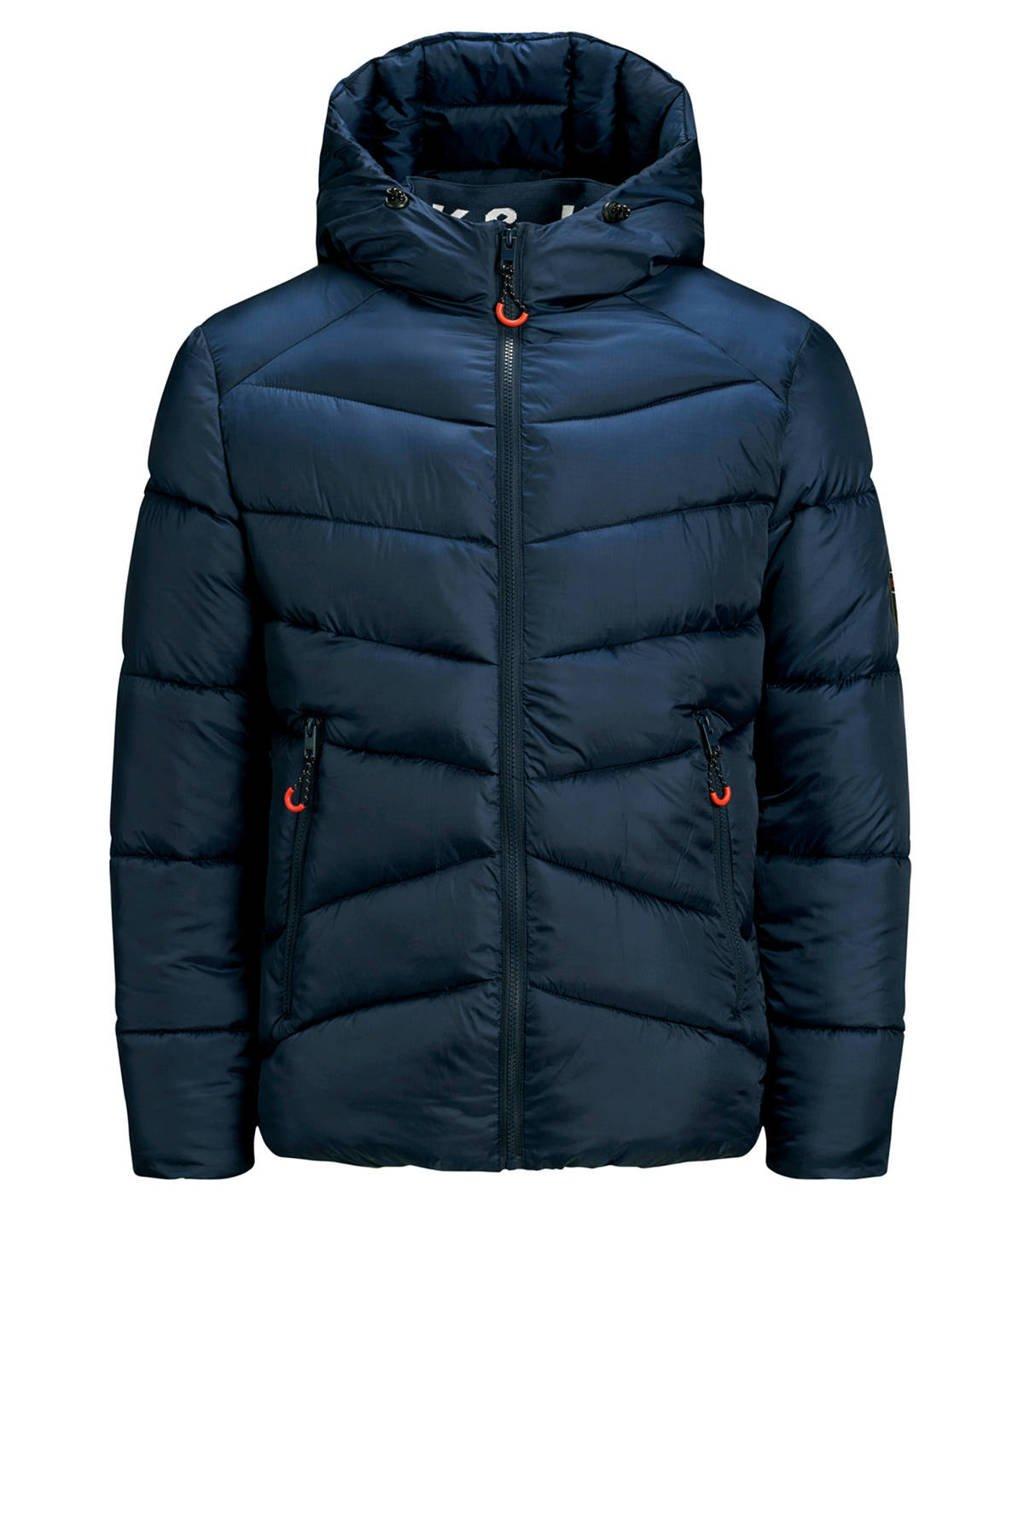 JACK & JONES JUNIOR gewatteerde winterjas Ander donkerblauw, Donkerblauw